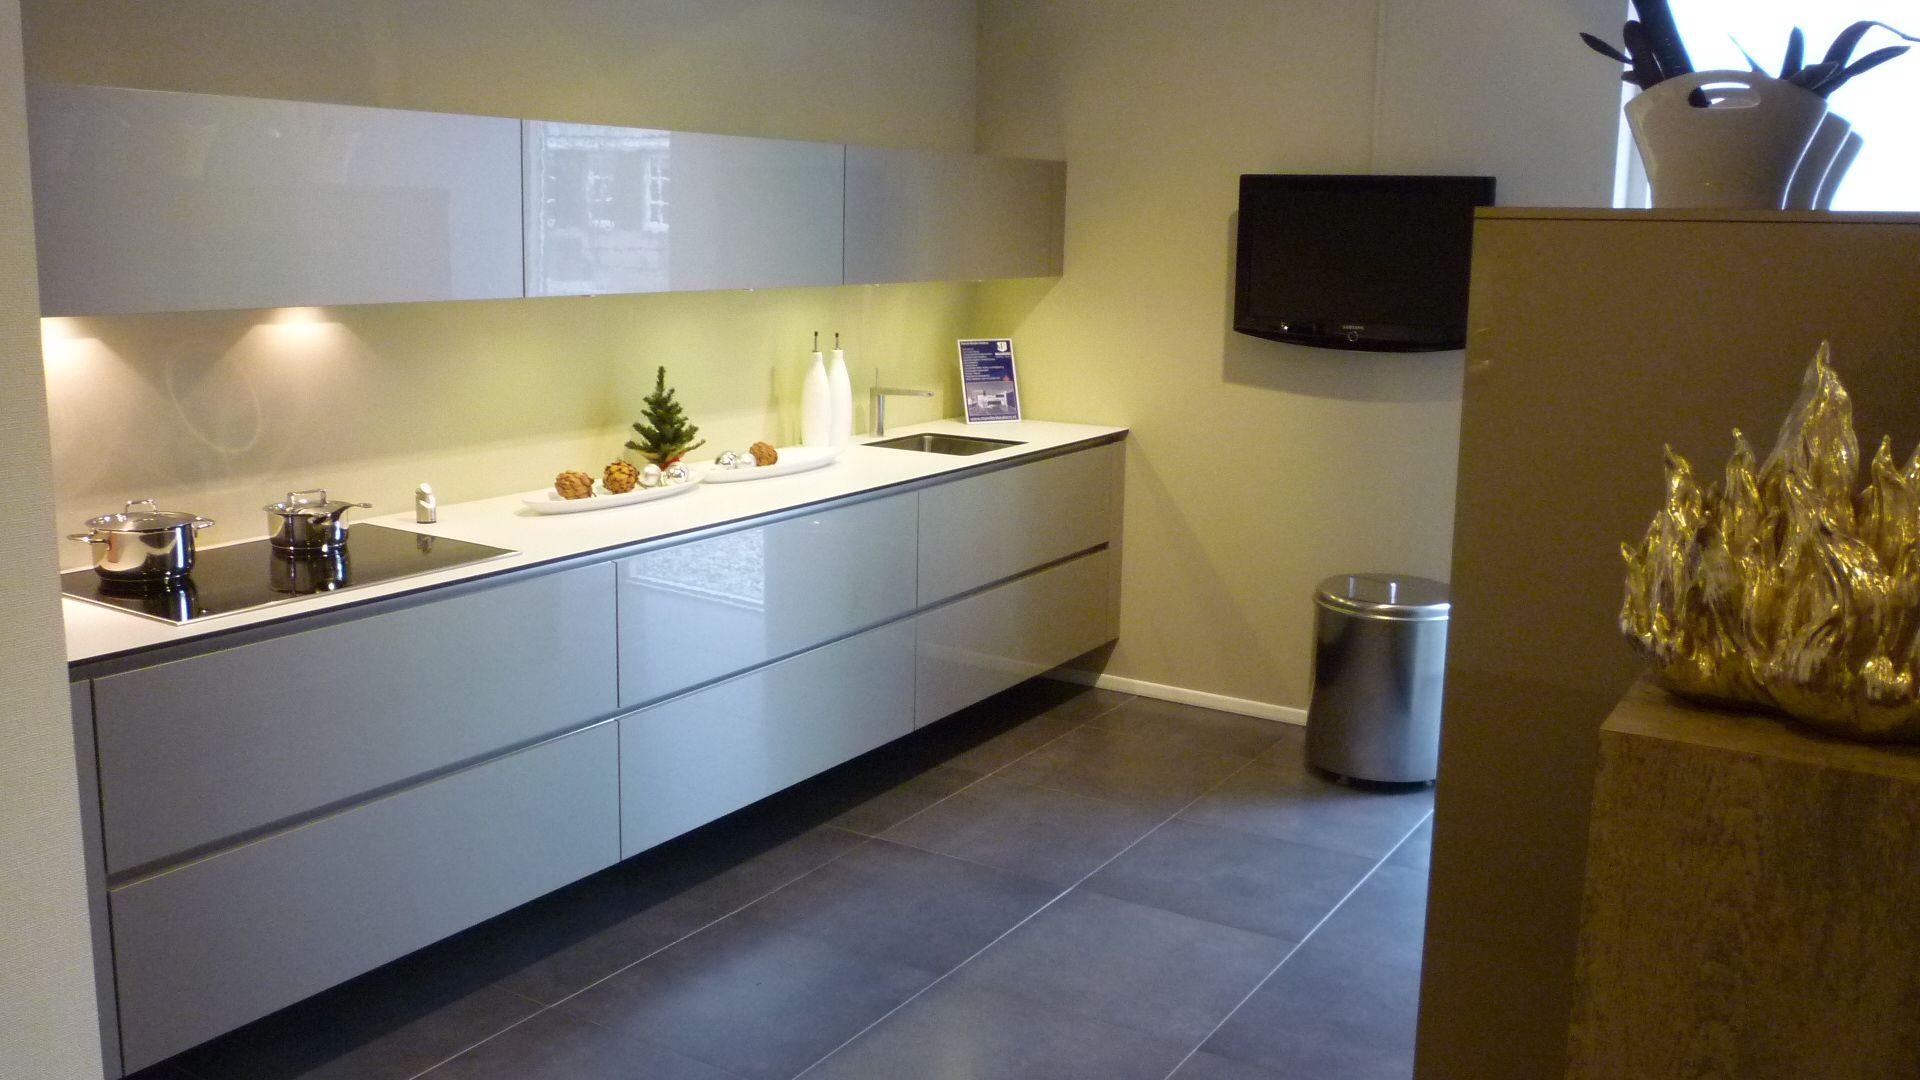 Design Hoogglans Keuken : Keukenkorting de grootste en voordeligste keukenwinkel van